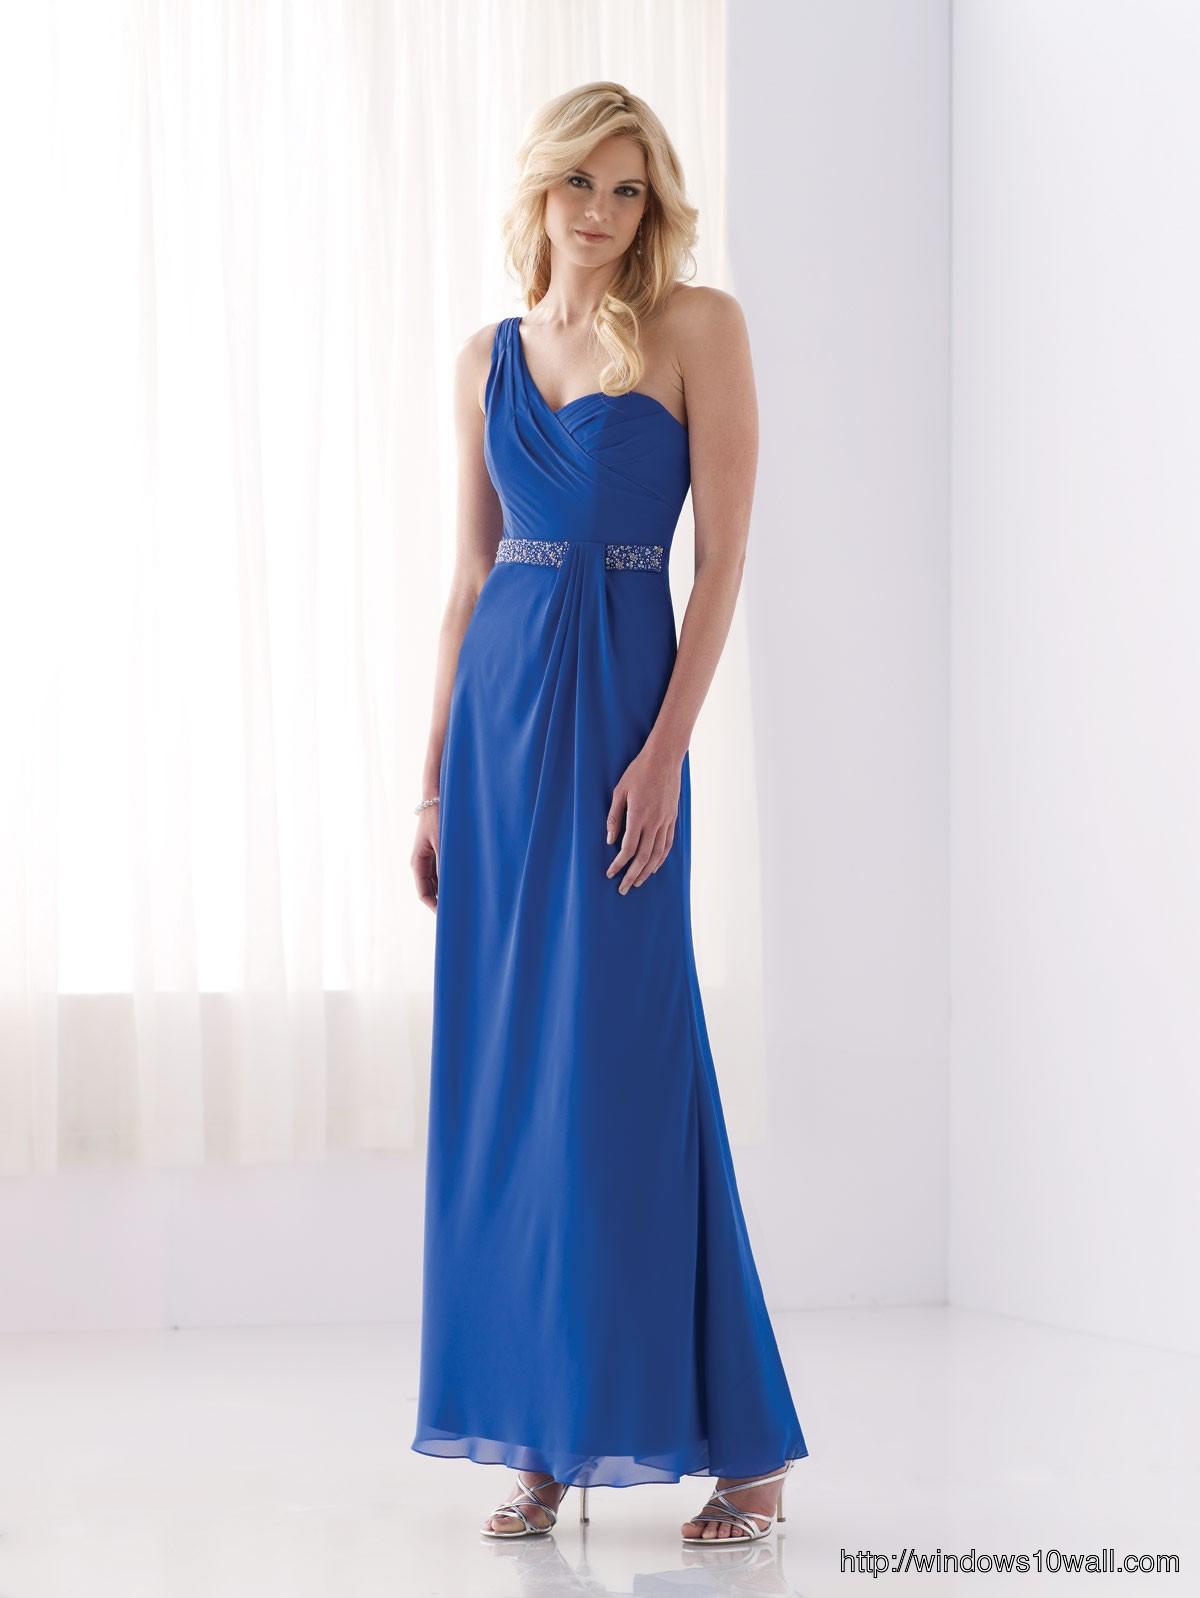 chiffon-one-shoulder-strap-bridesmaid-dress-background-wallpaper